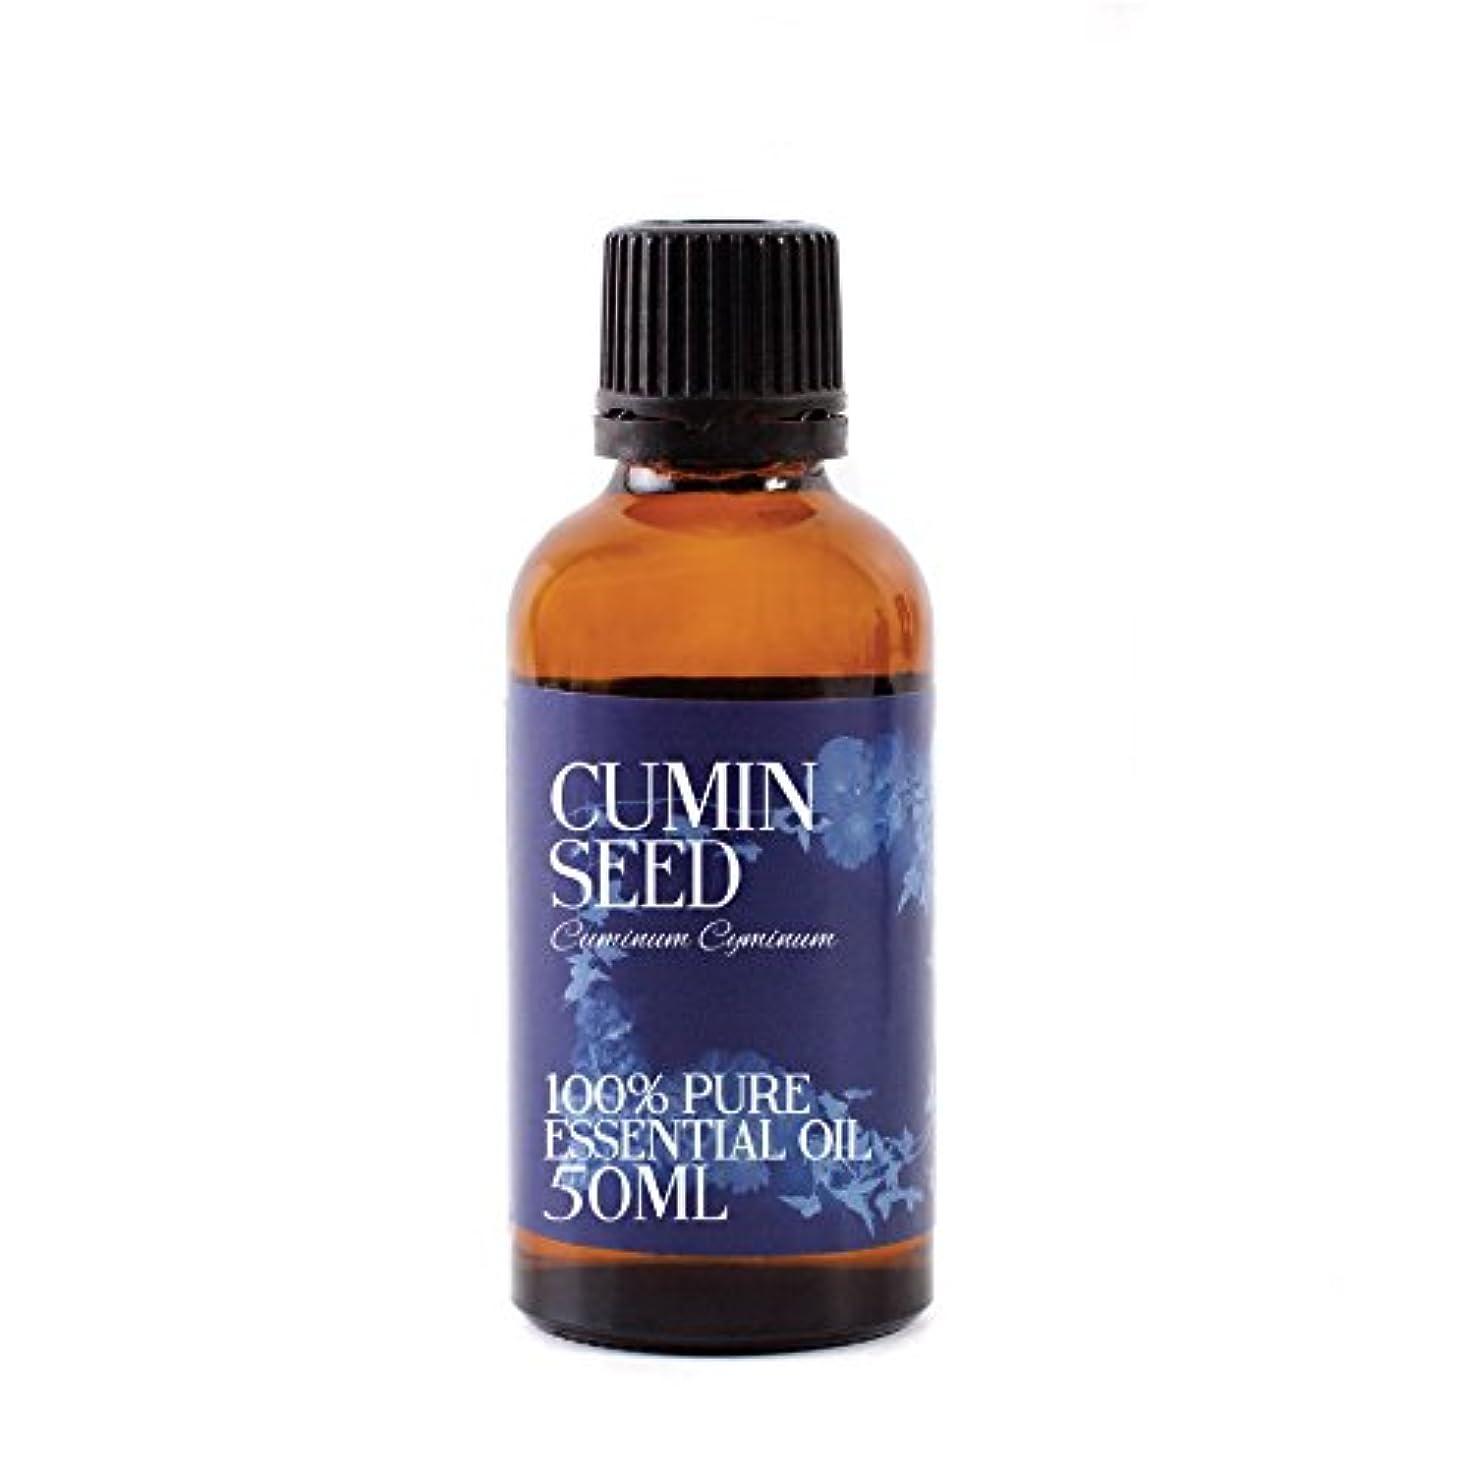 Mystic Moments | Cumin Seed Essential Oil - 50ml - 100% Pure